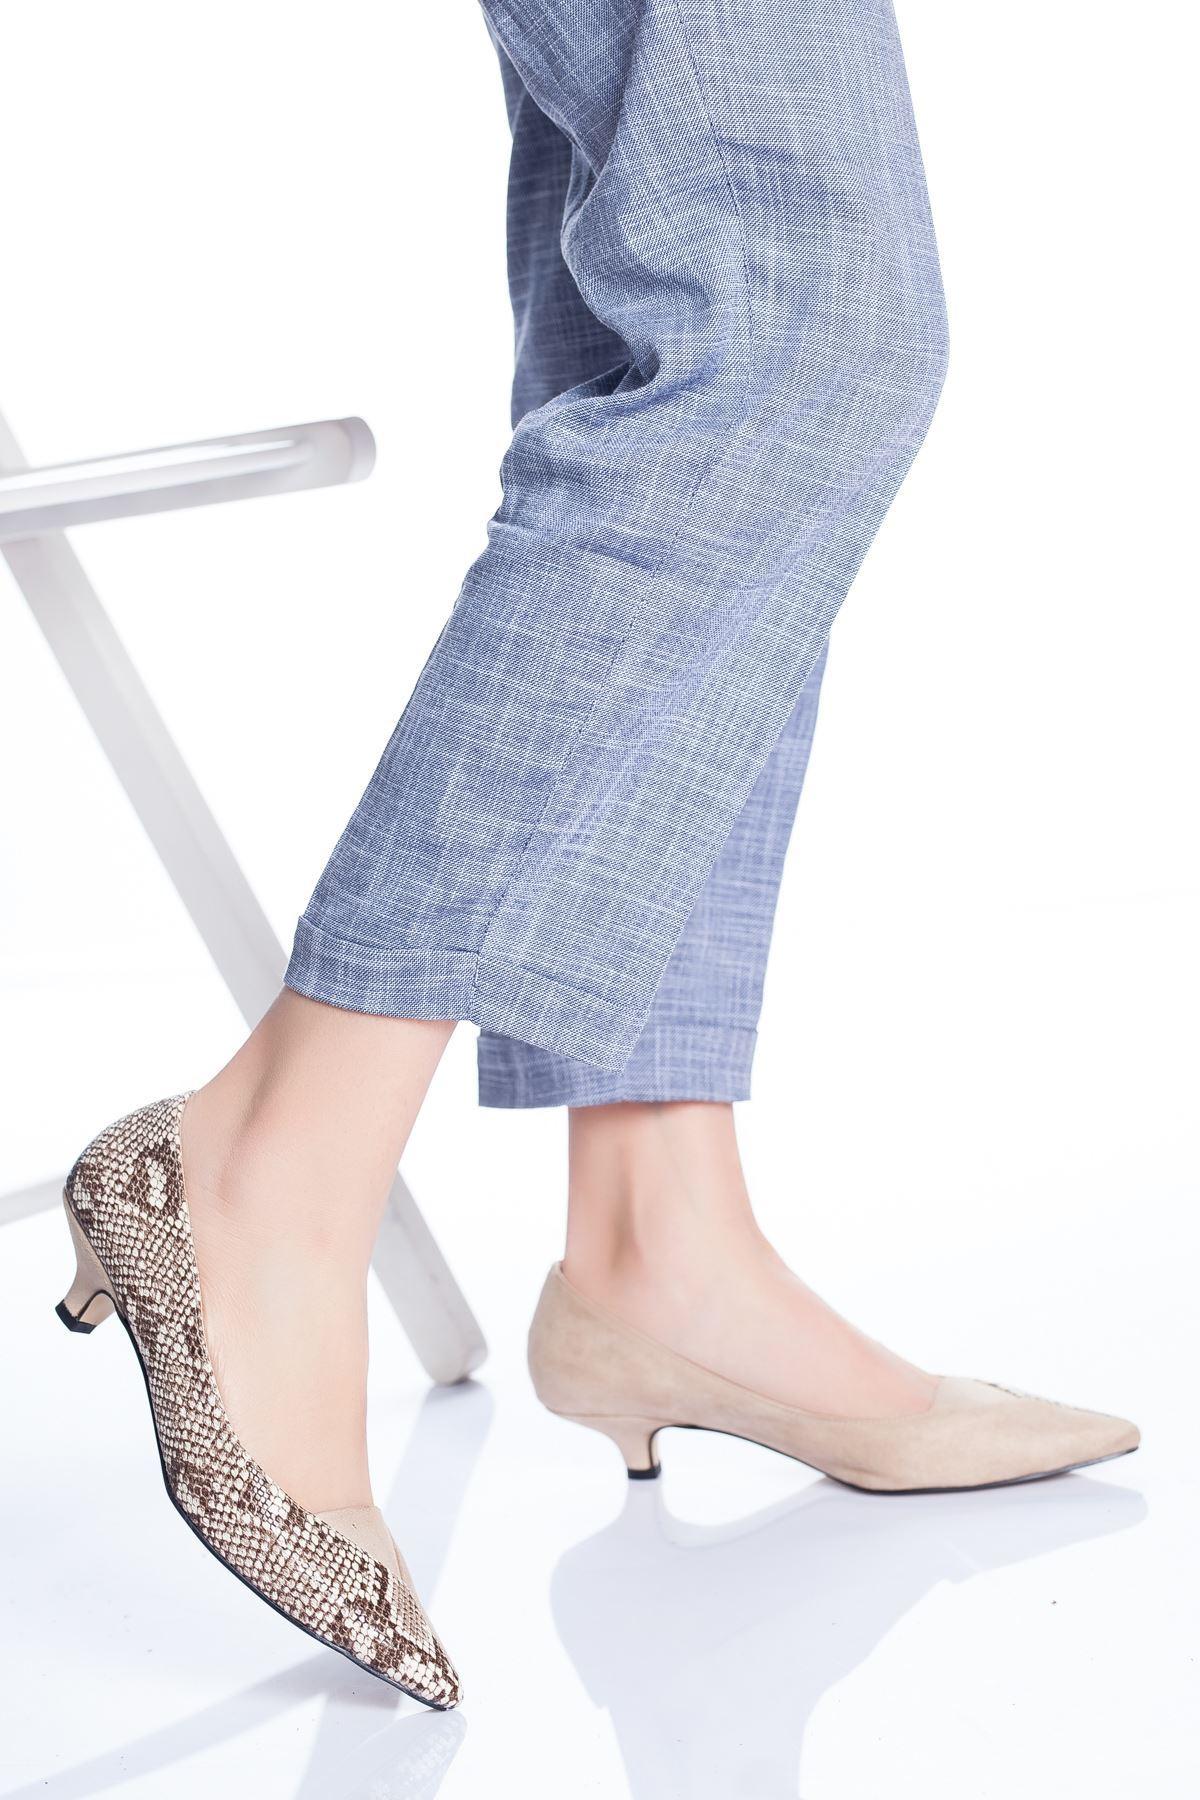 Odella Topuklu Ayakkabı TEN-YILAN